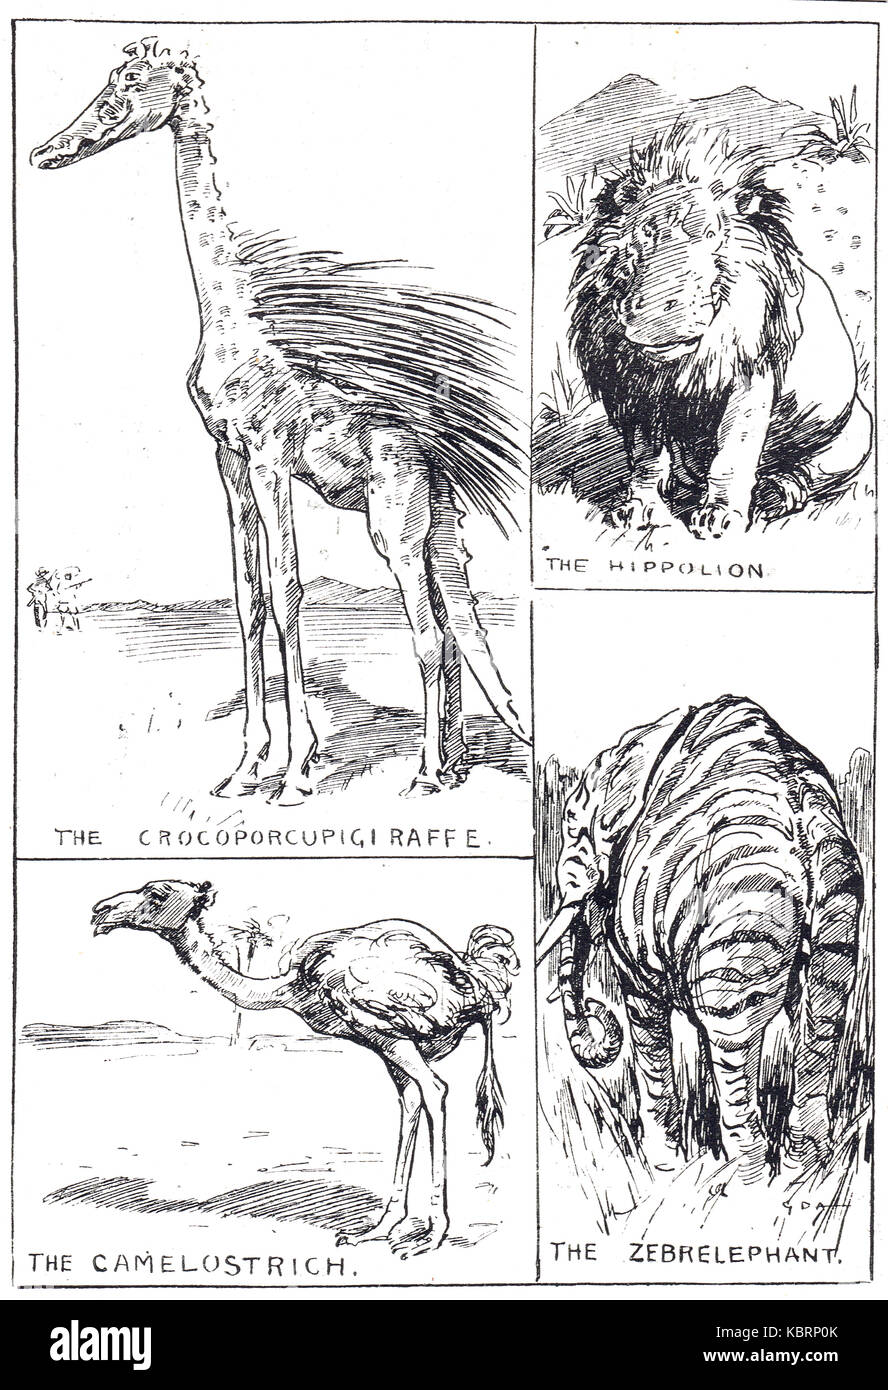 Las criaturas de fantasía, camelostrich zebrelephant hippolion,,, & crocoporcupigiraffe. punch cartoon Imagen De Stock